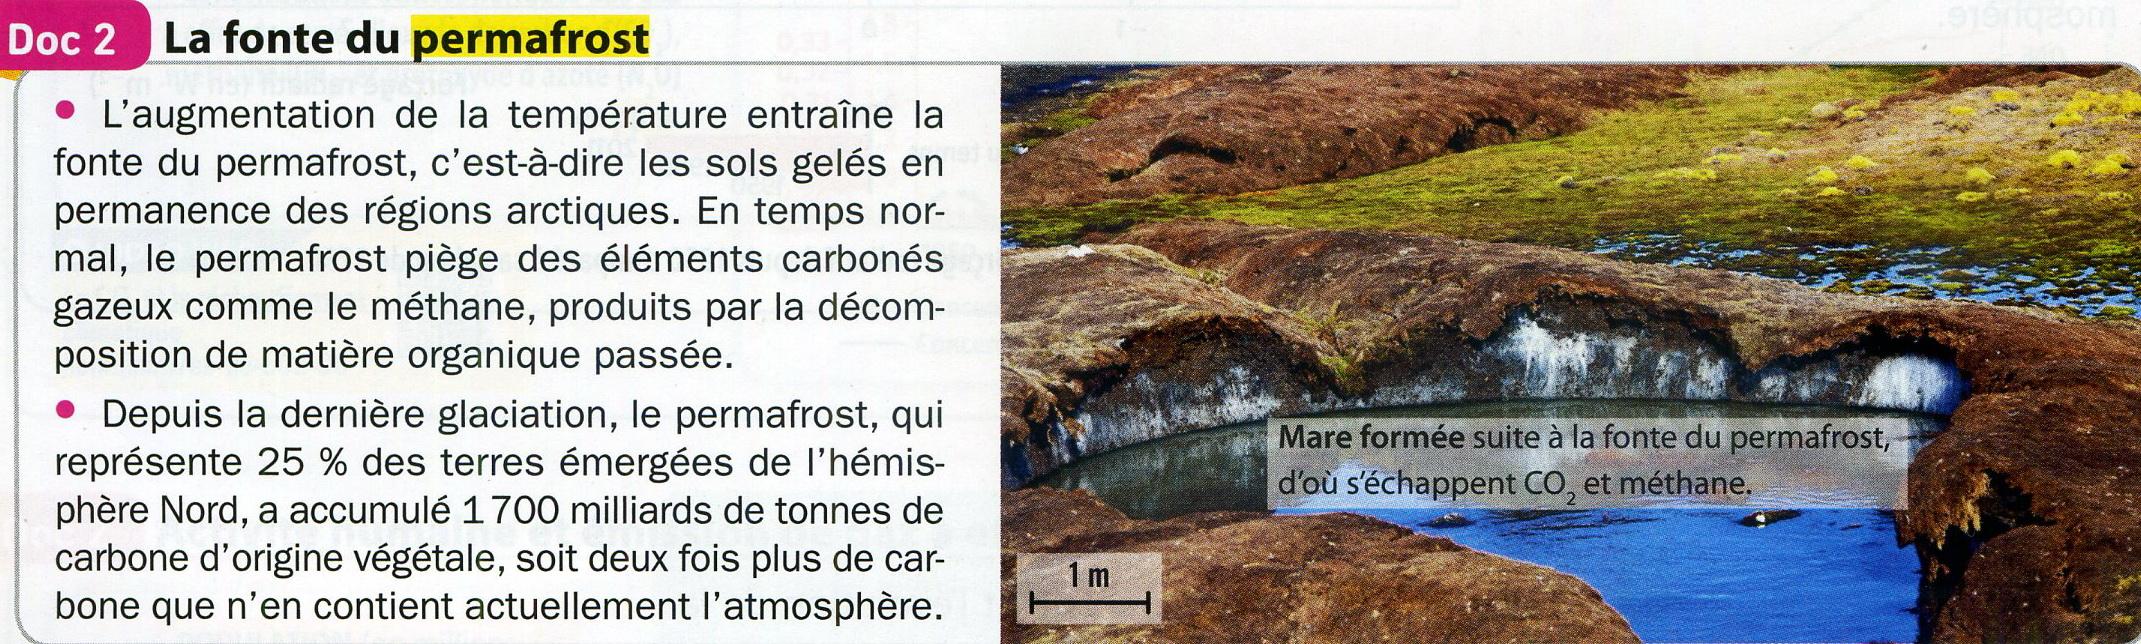 Permafrost fonte